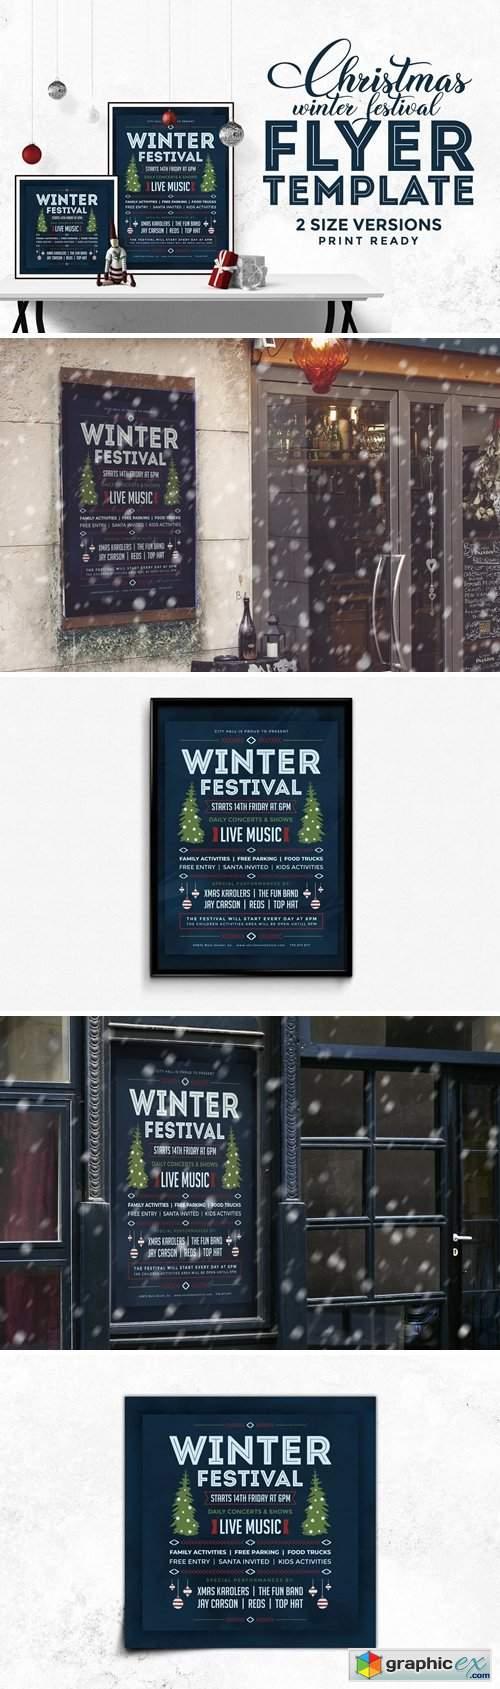 Winter Festival Flyer Template 4296596